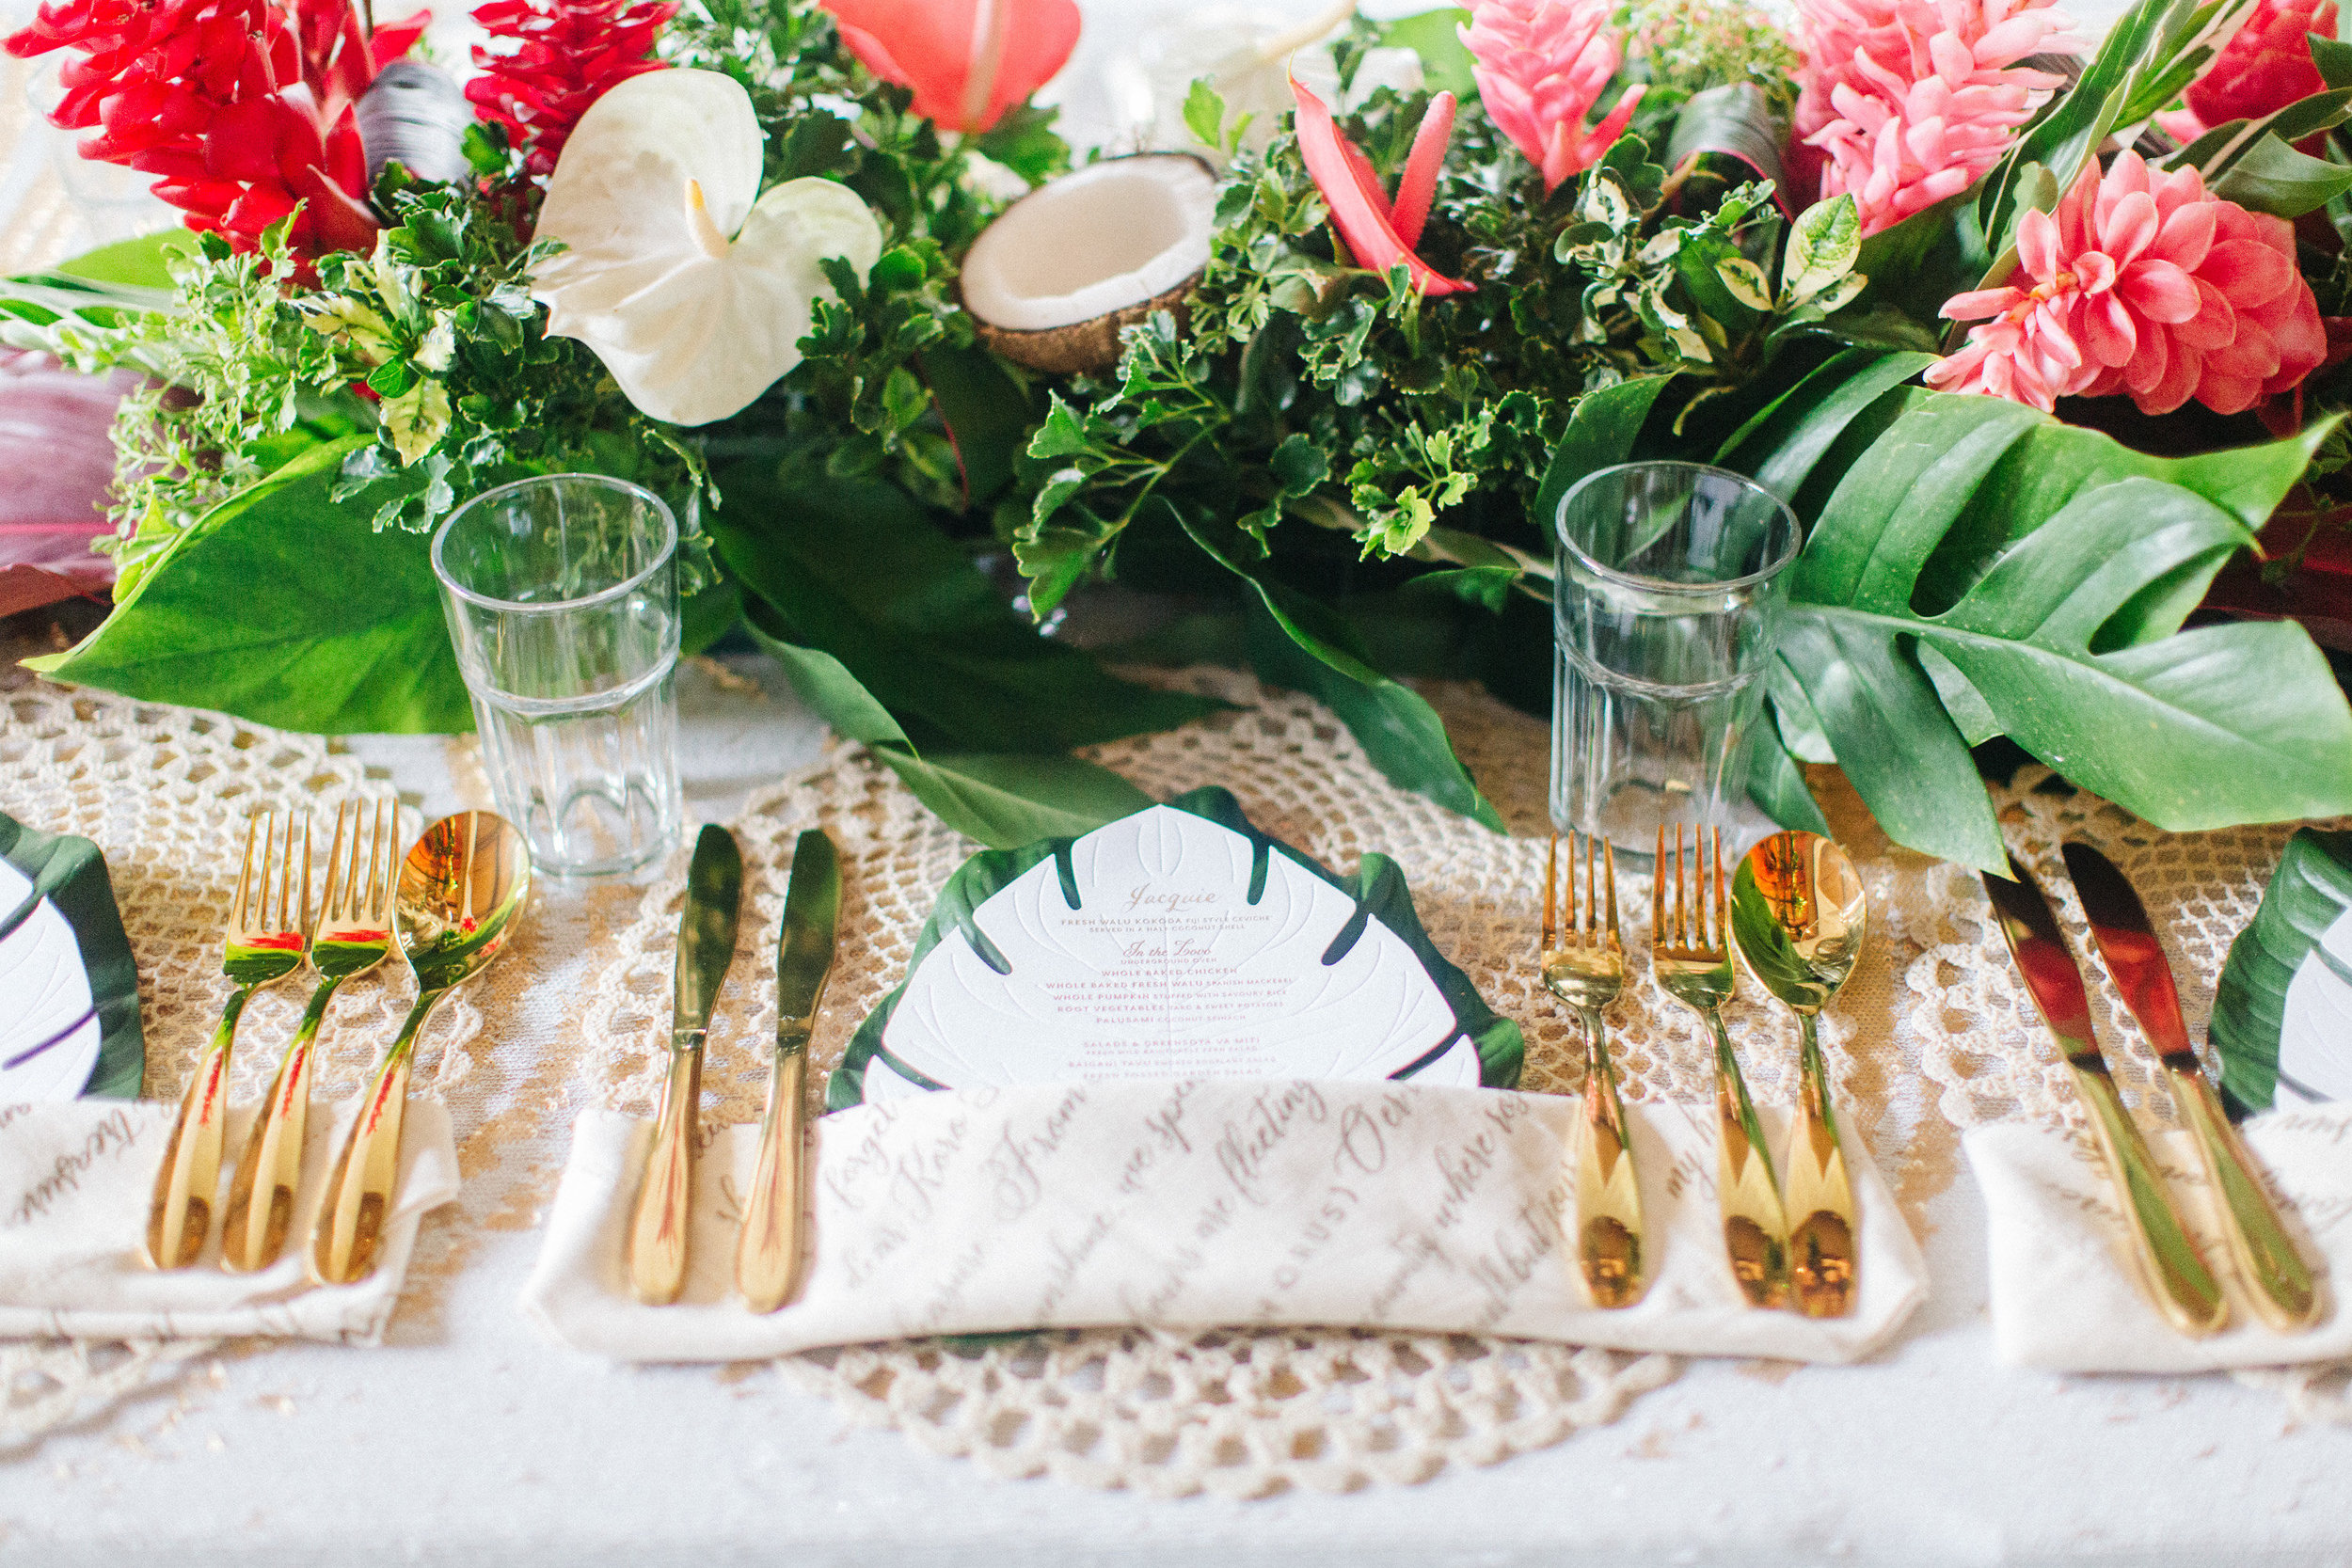 destination_fiji_wedding_tropical_flowers_centrepiece_gold_cutlery_macrame_placemat.jpg